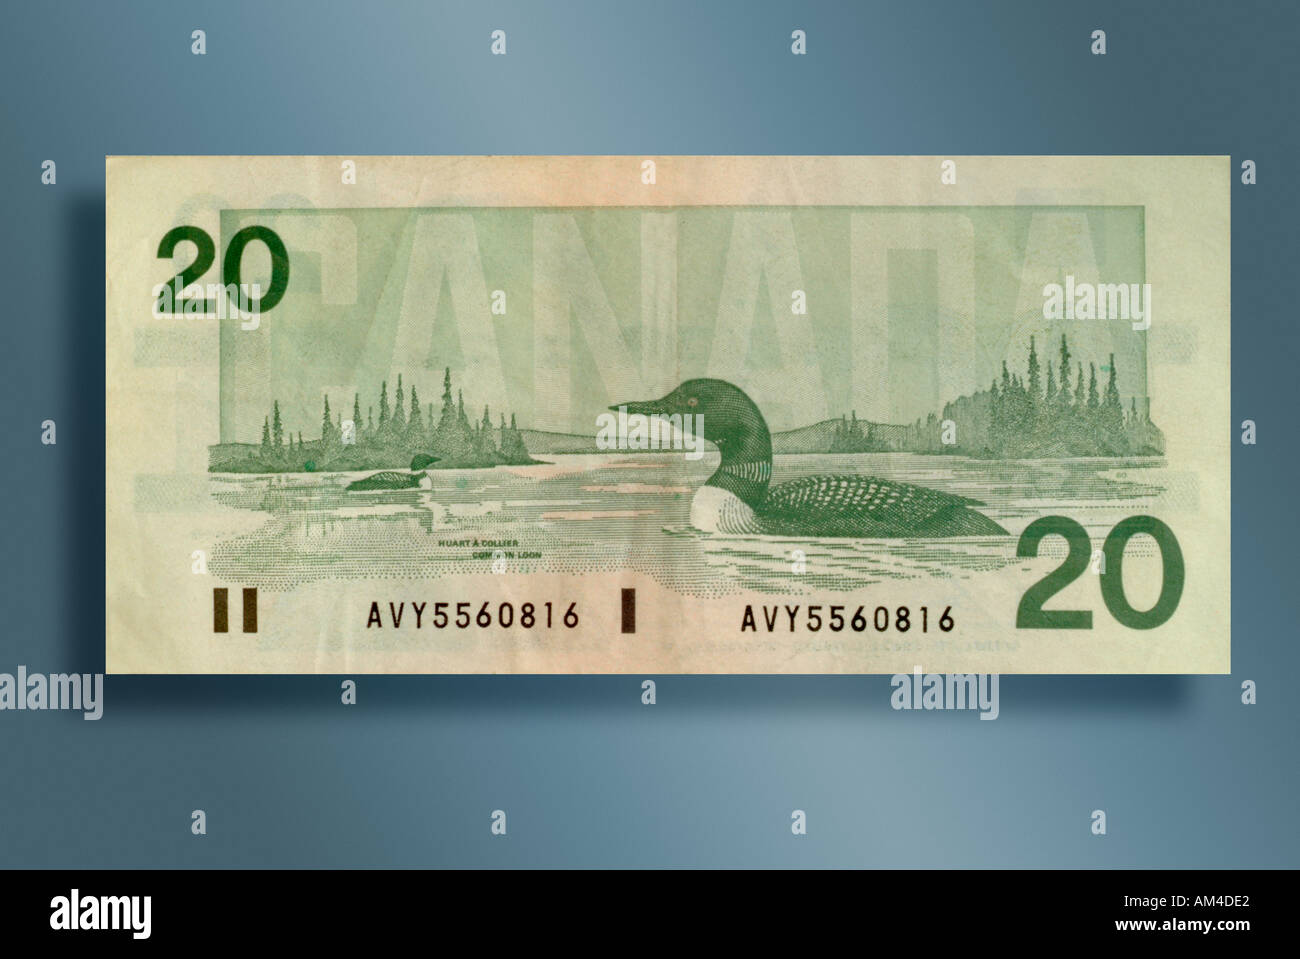 20 dollar bill from Canada - Stock Image